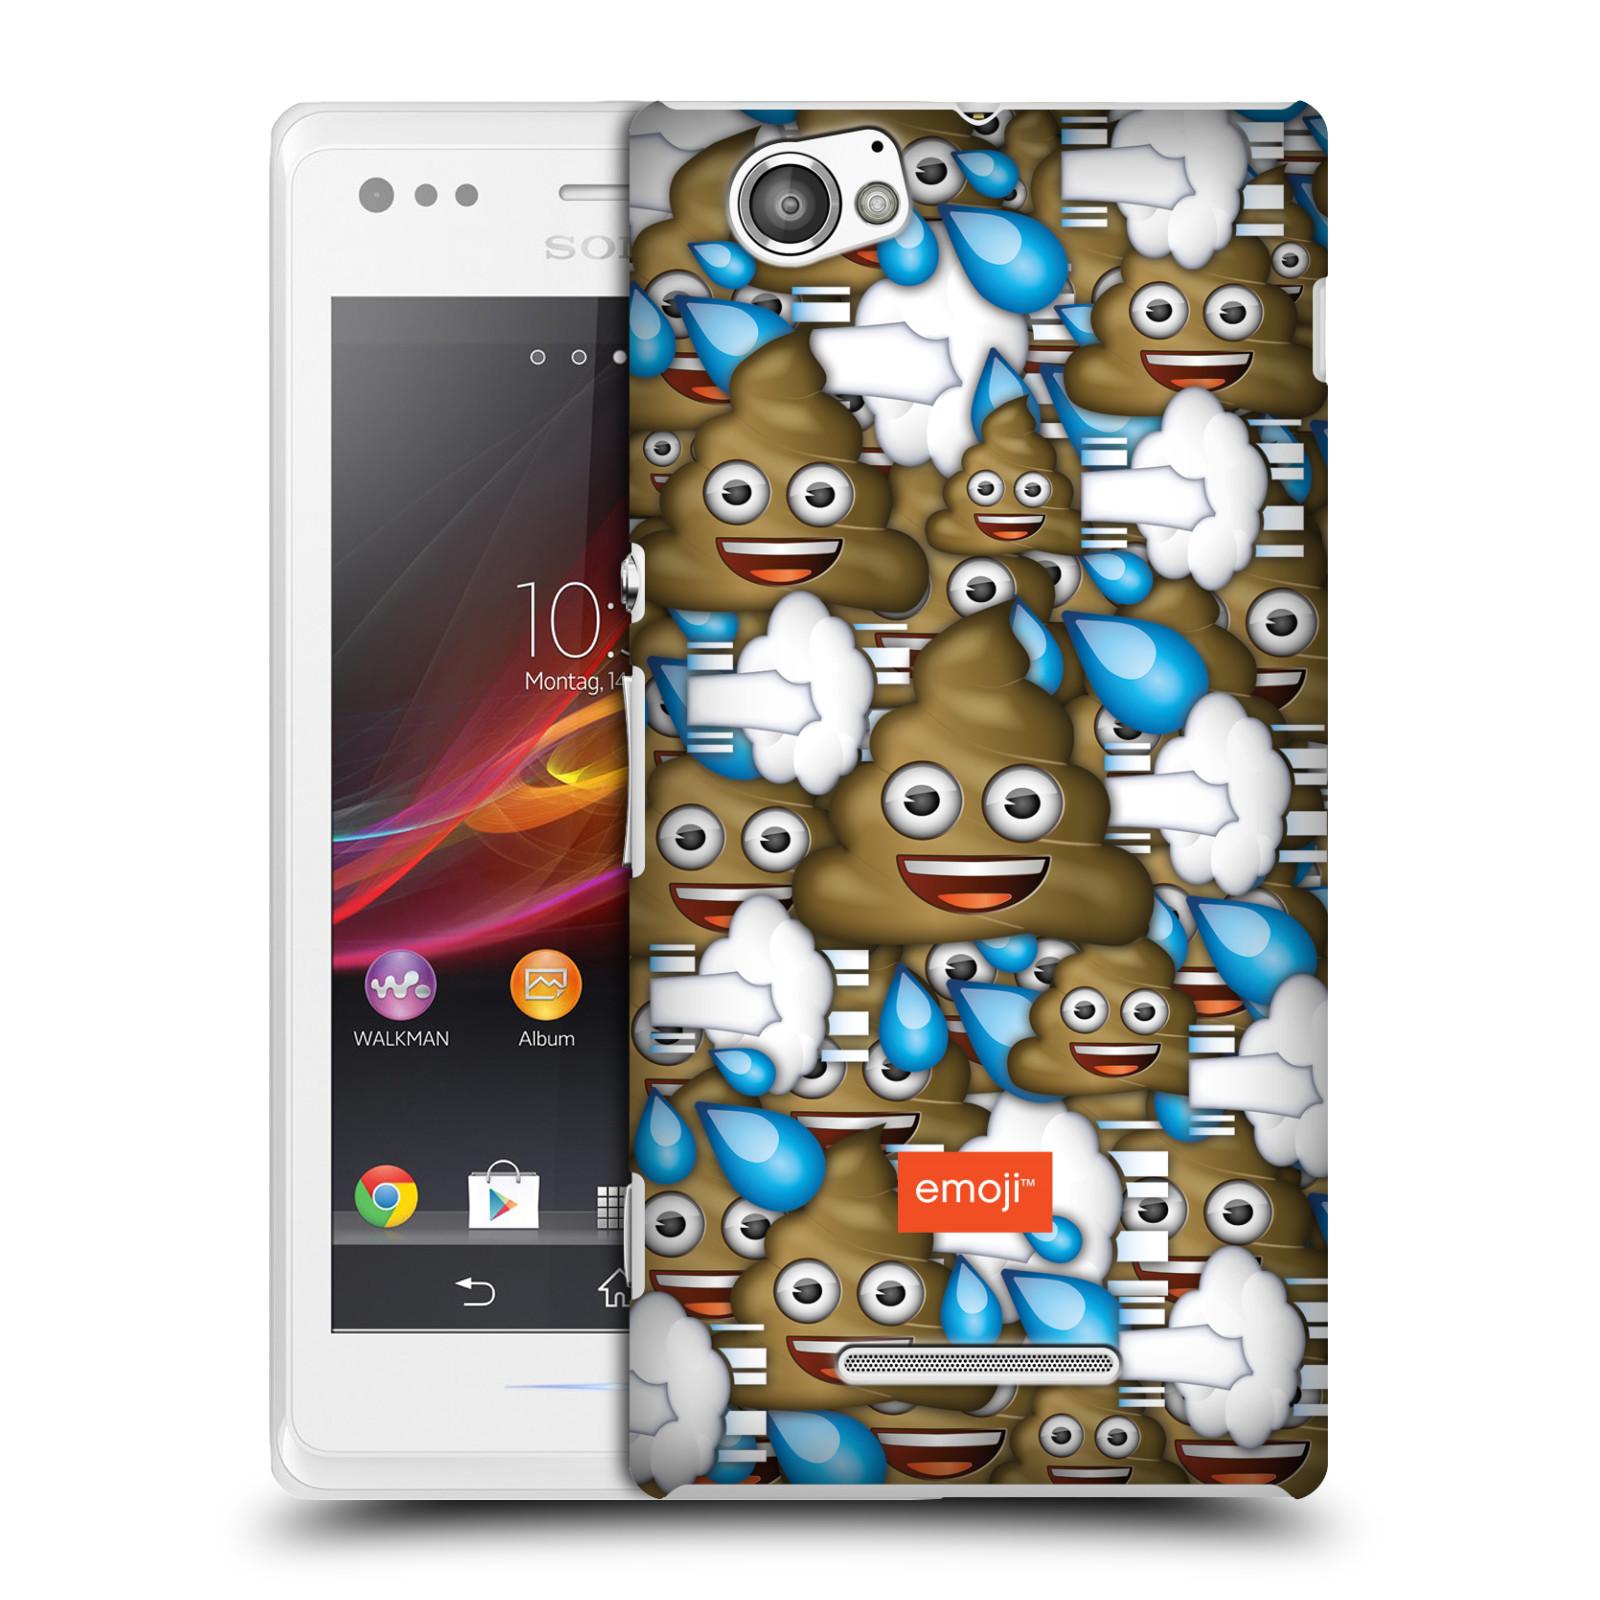 Plastové pouzdro na mobil Sony Xperia M C1905 HEAD CASE EMOJI - Hovínka a prdíky (Kryt či obal s oficiálním motivem EMOJI na mobilní telefon Sony Xperia M )